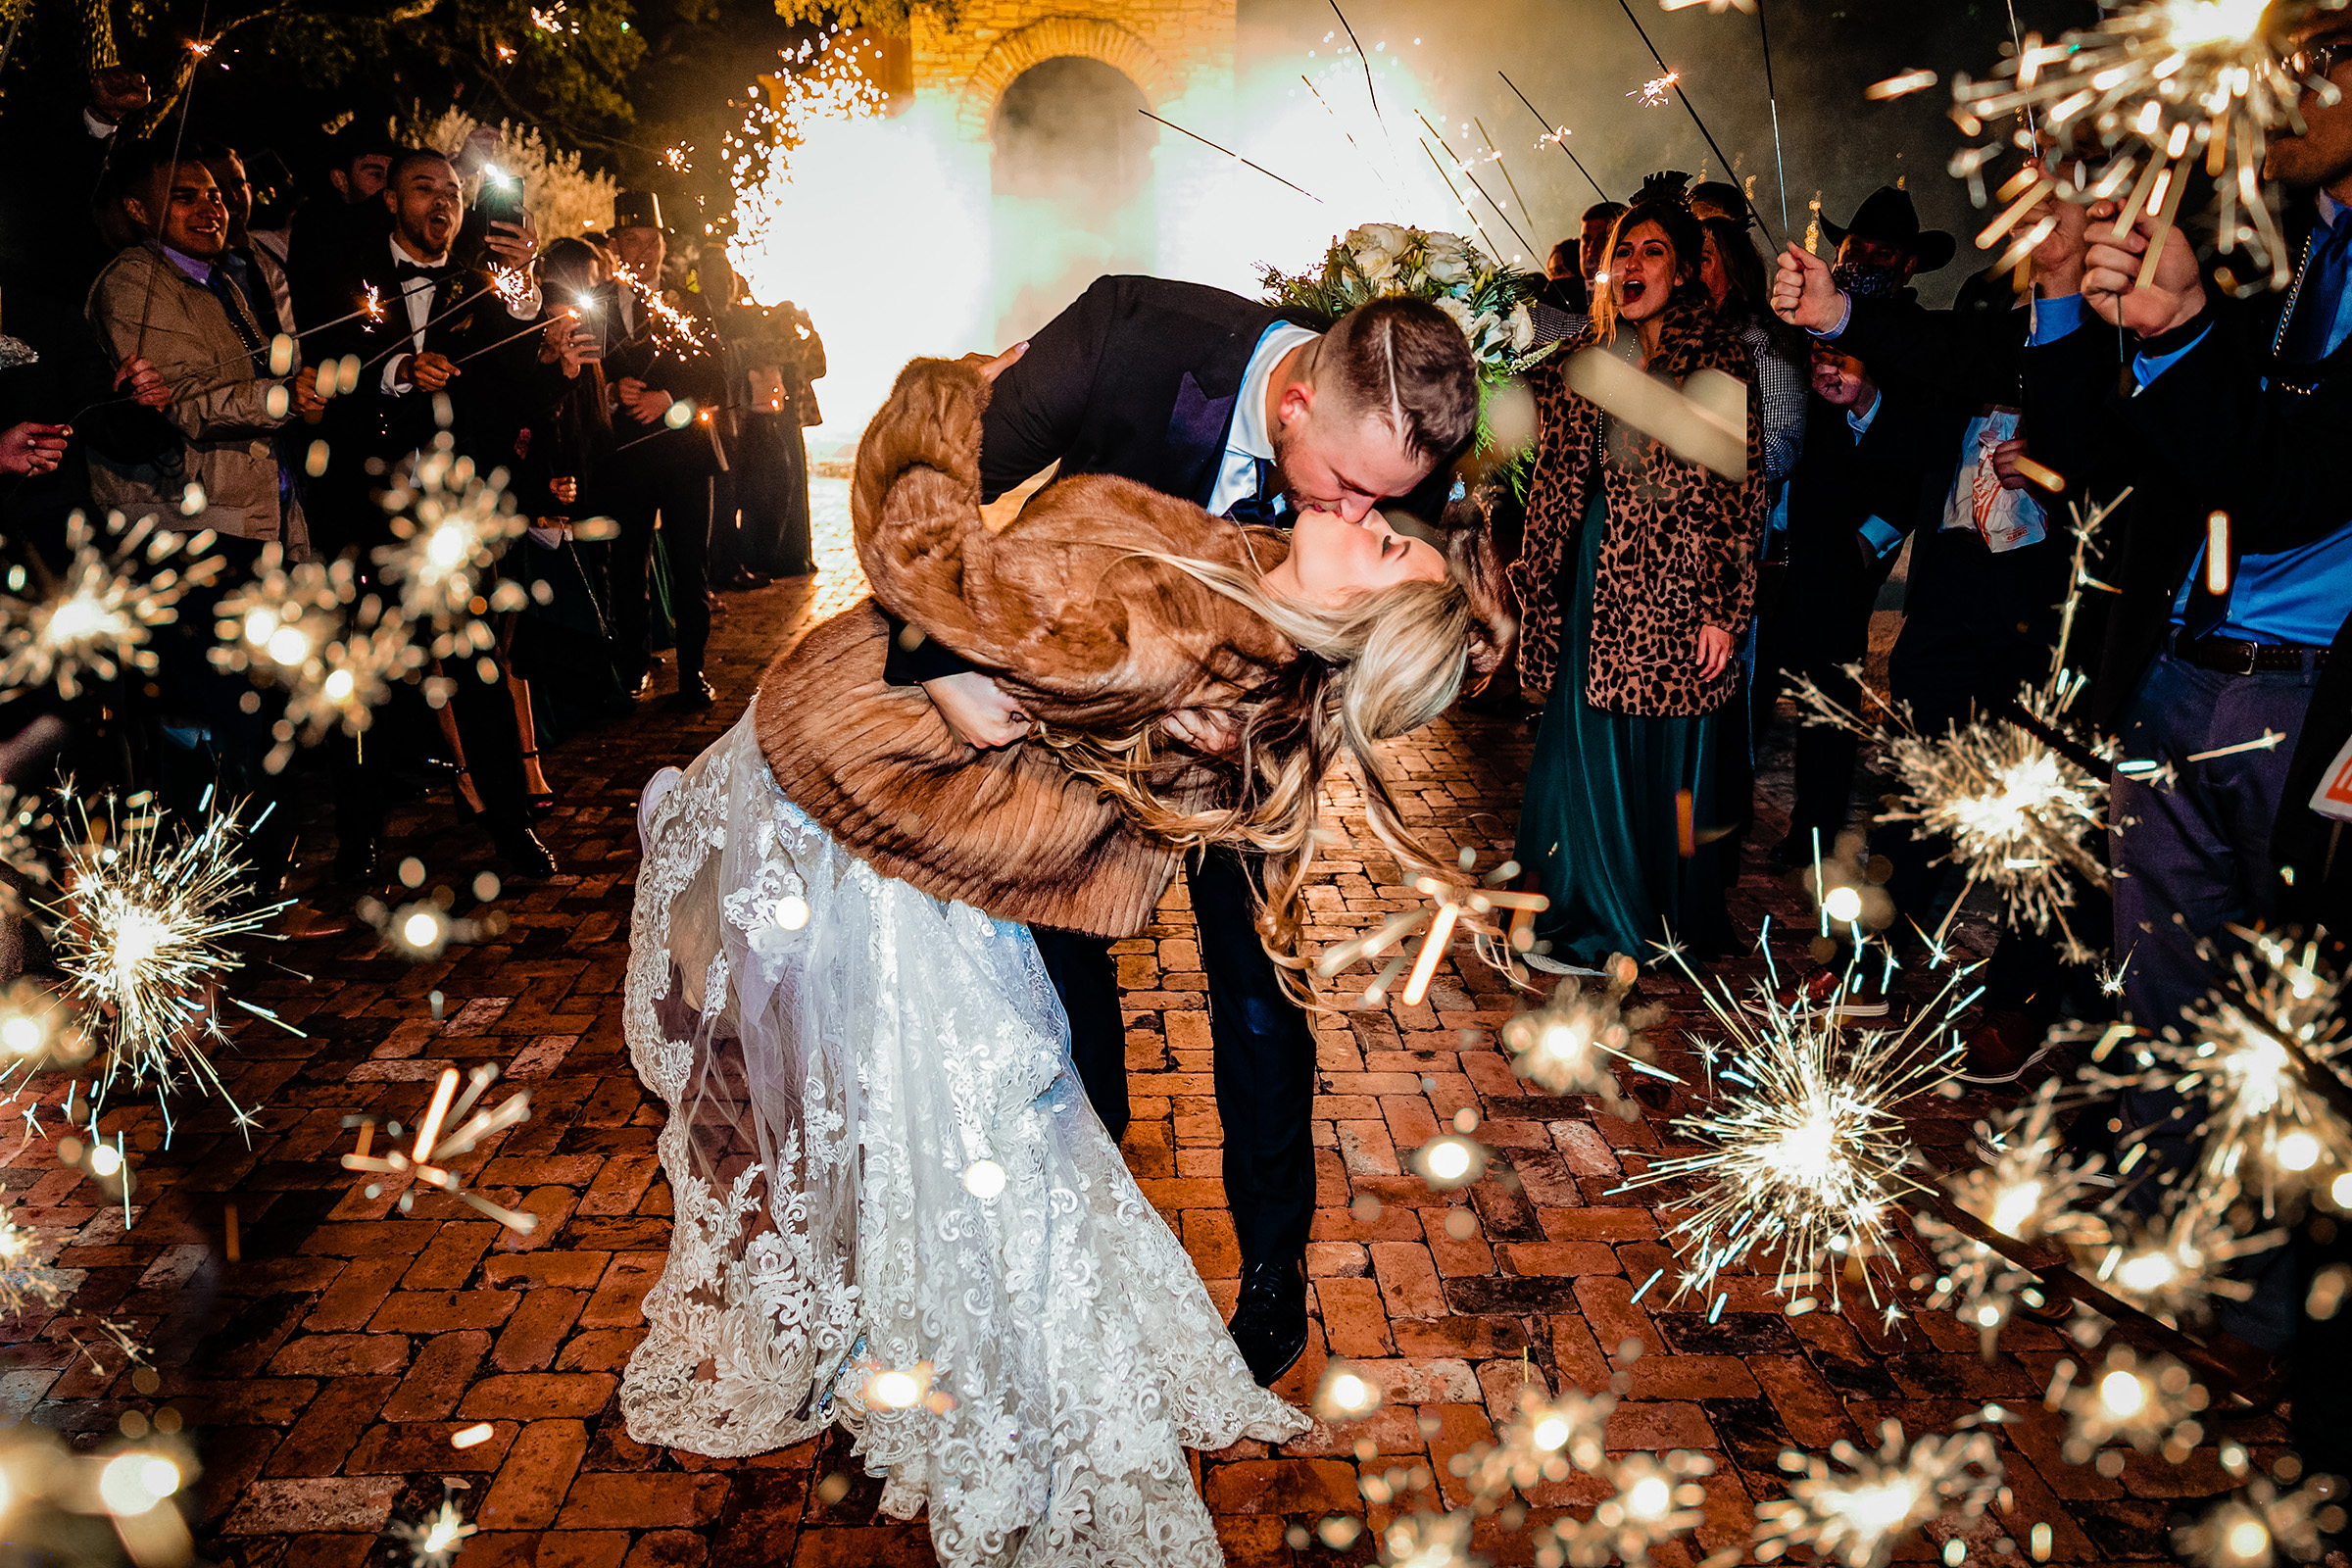 Photographed by Al Gawlik, Texas wedding photographer